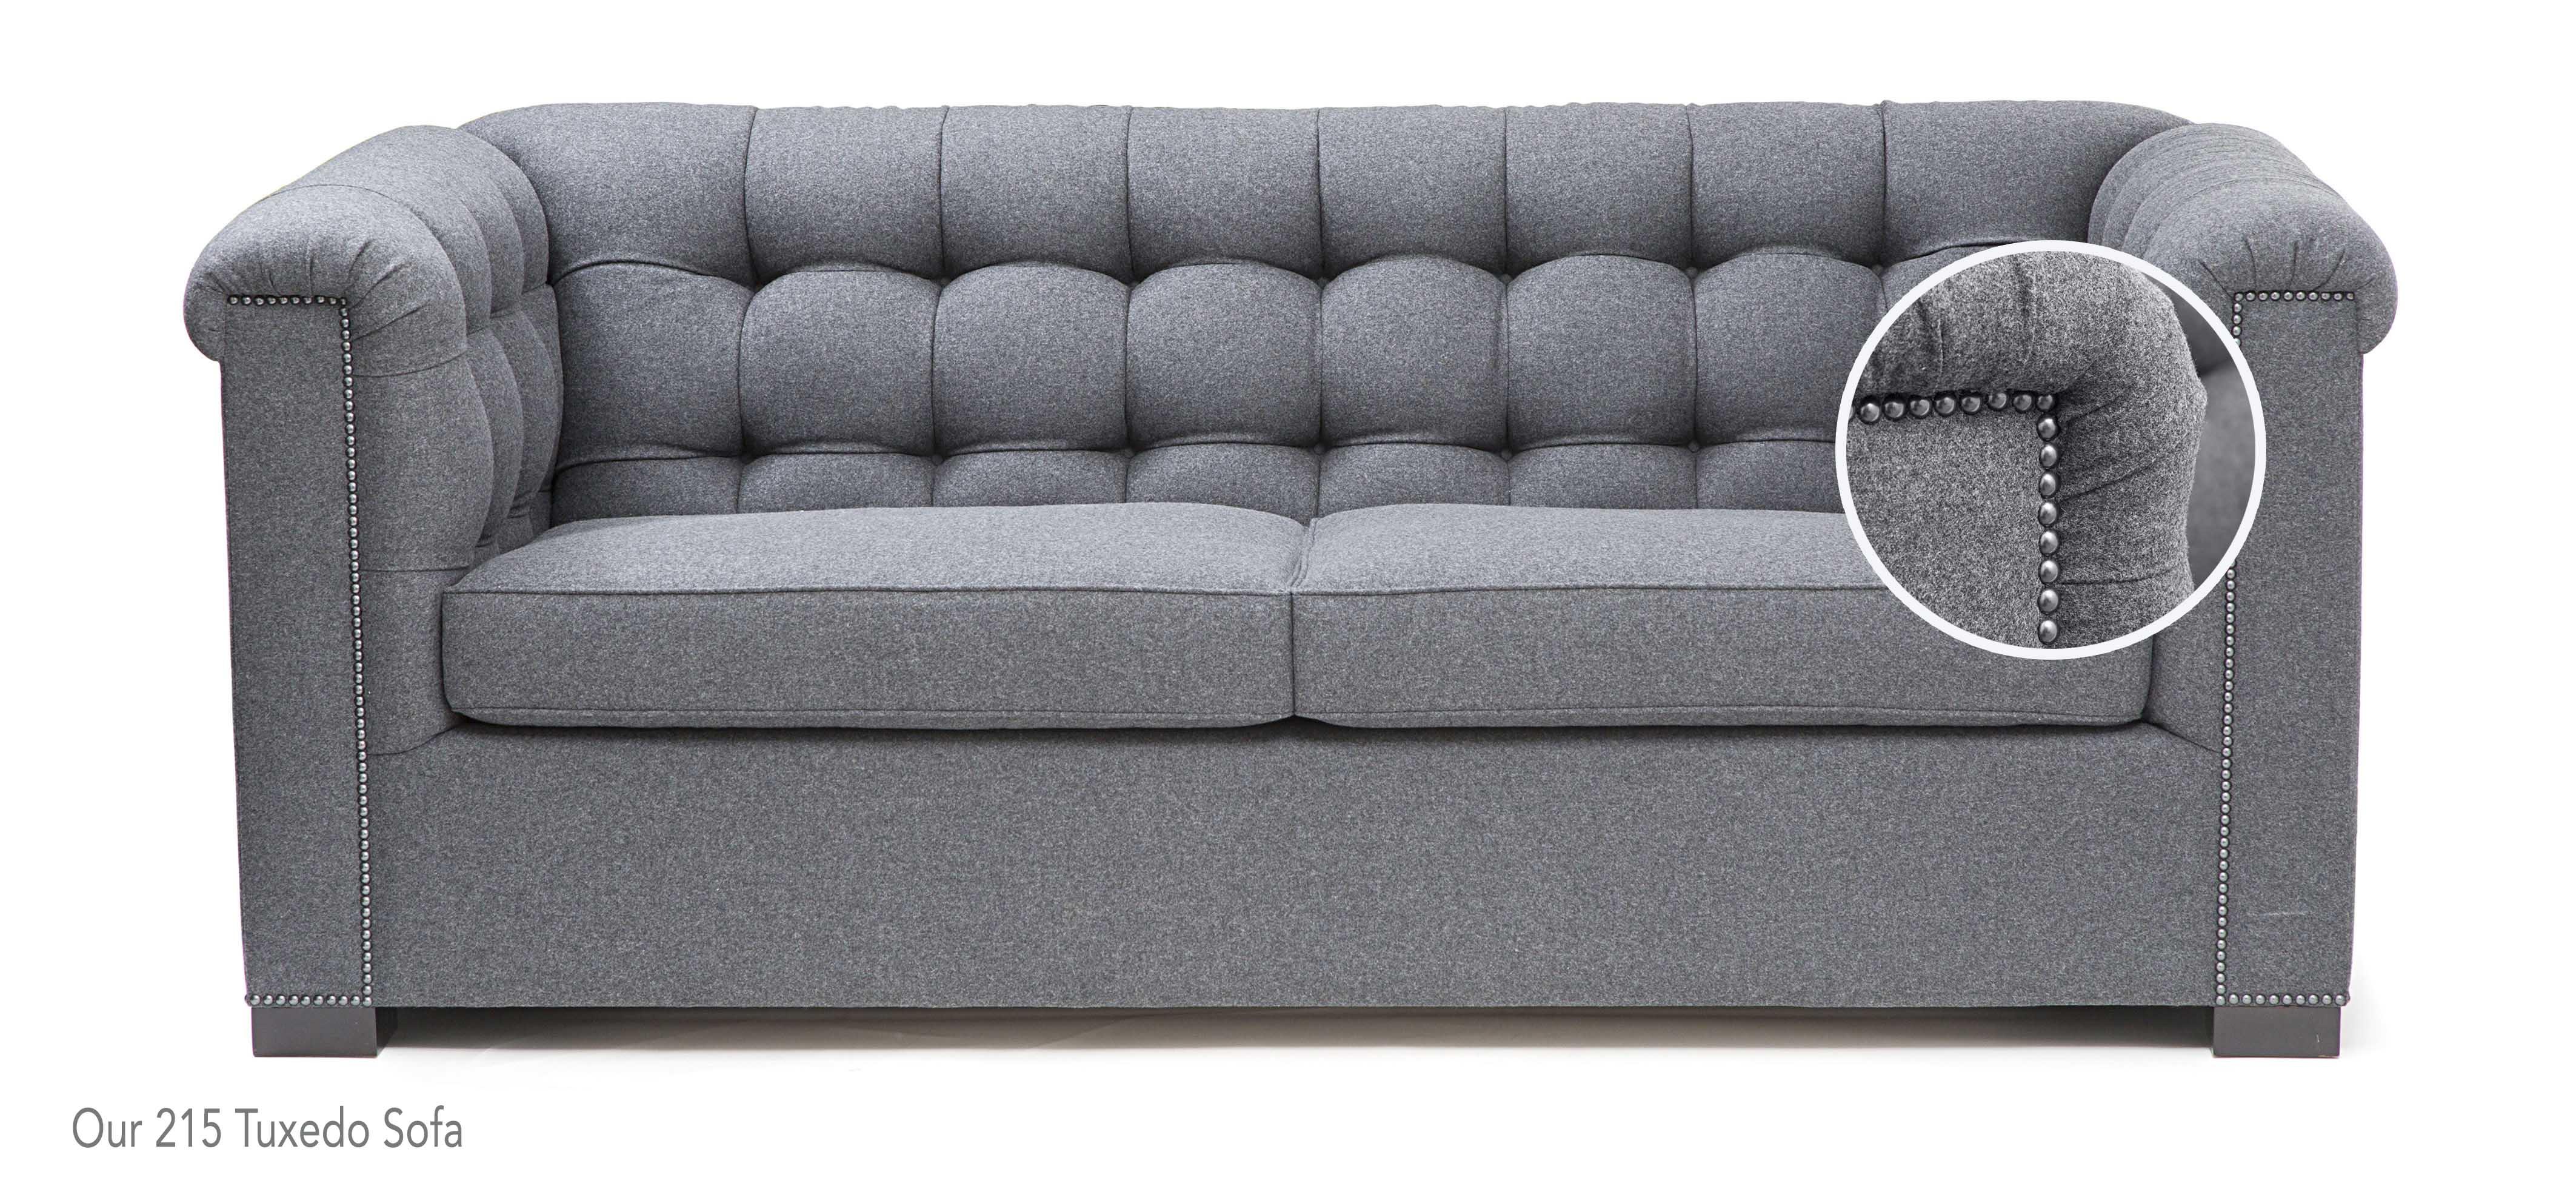 Custom Sofas - Sofa Beds - Chairs - Ottomans - Headboards ...